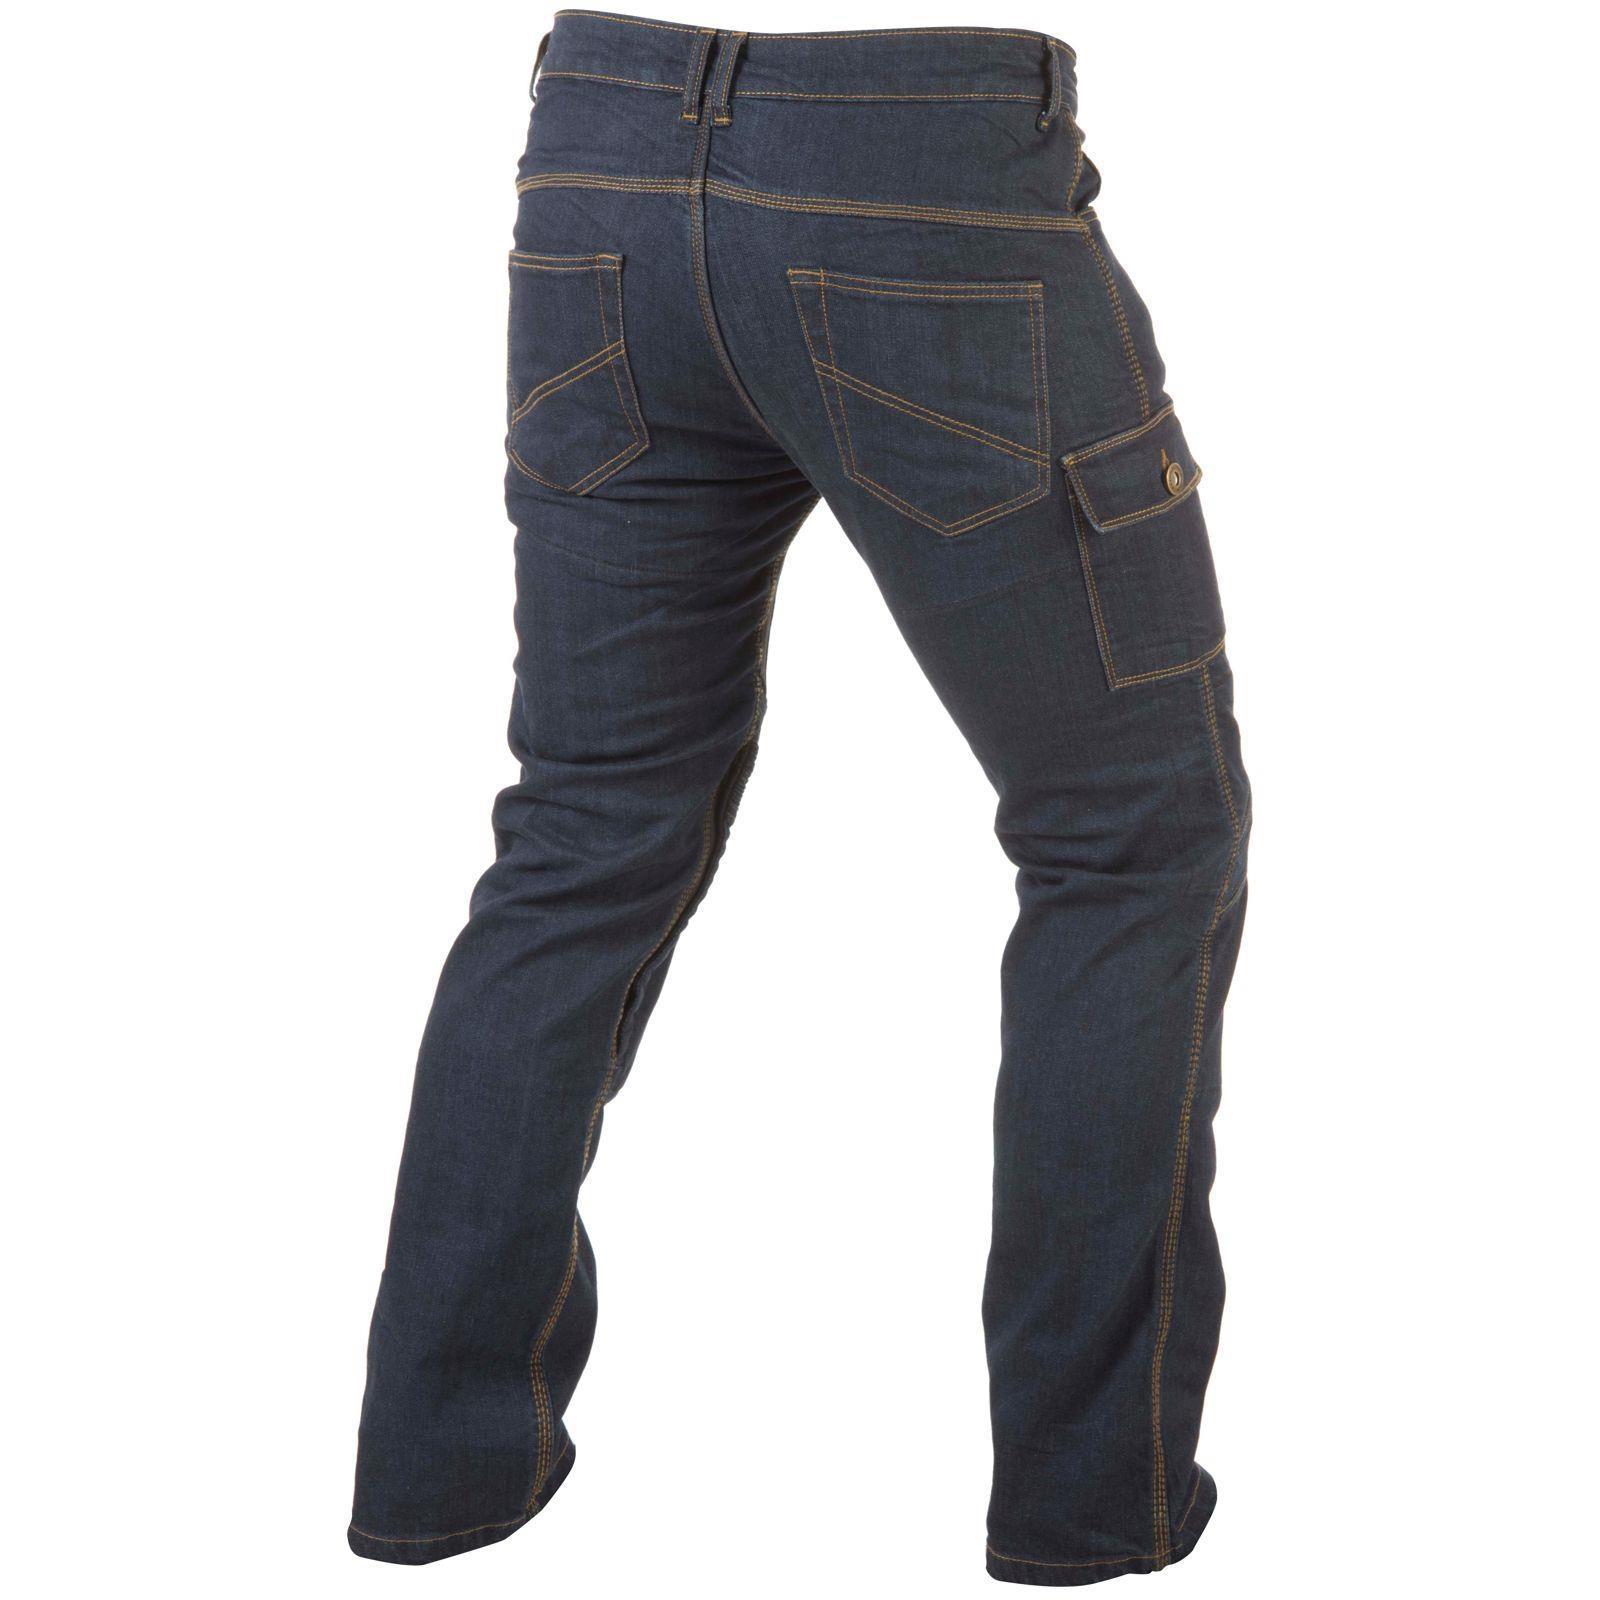 Trilobite-Pantaloni-Moto-Jeans-Abbigliamento-Parado-MICAS-URBAN-DUAL-PANTS-ACID miniatura 65